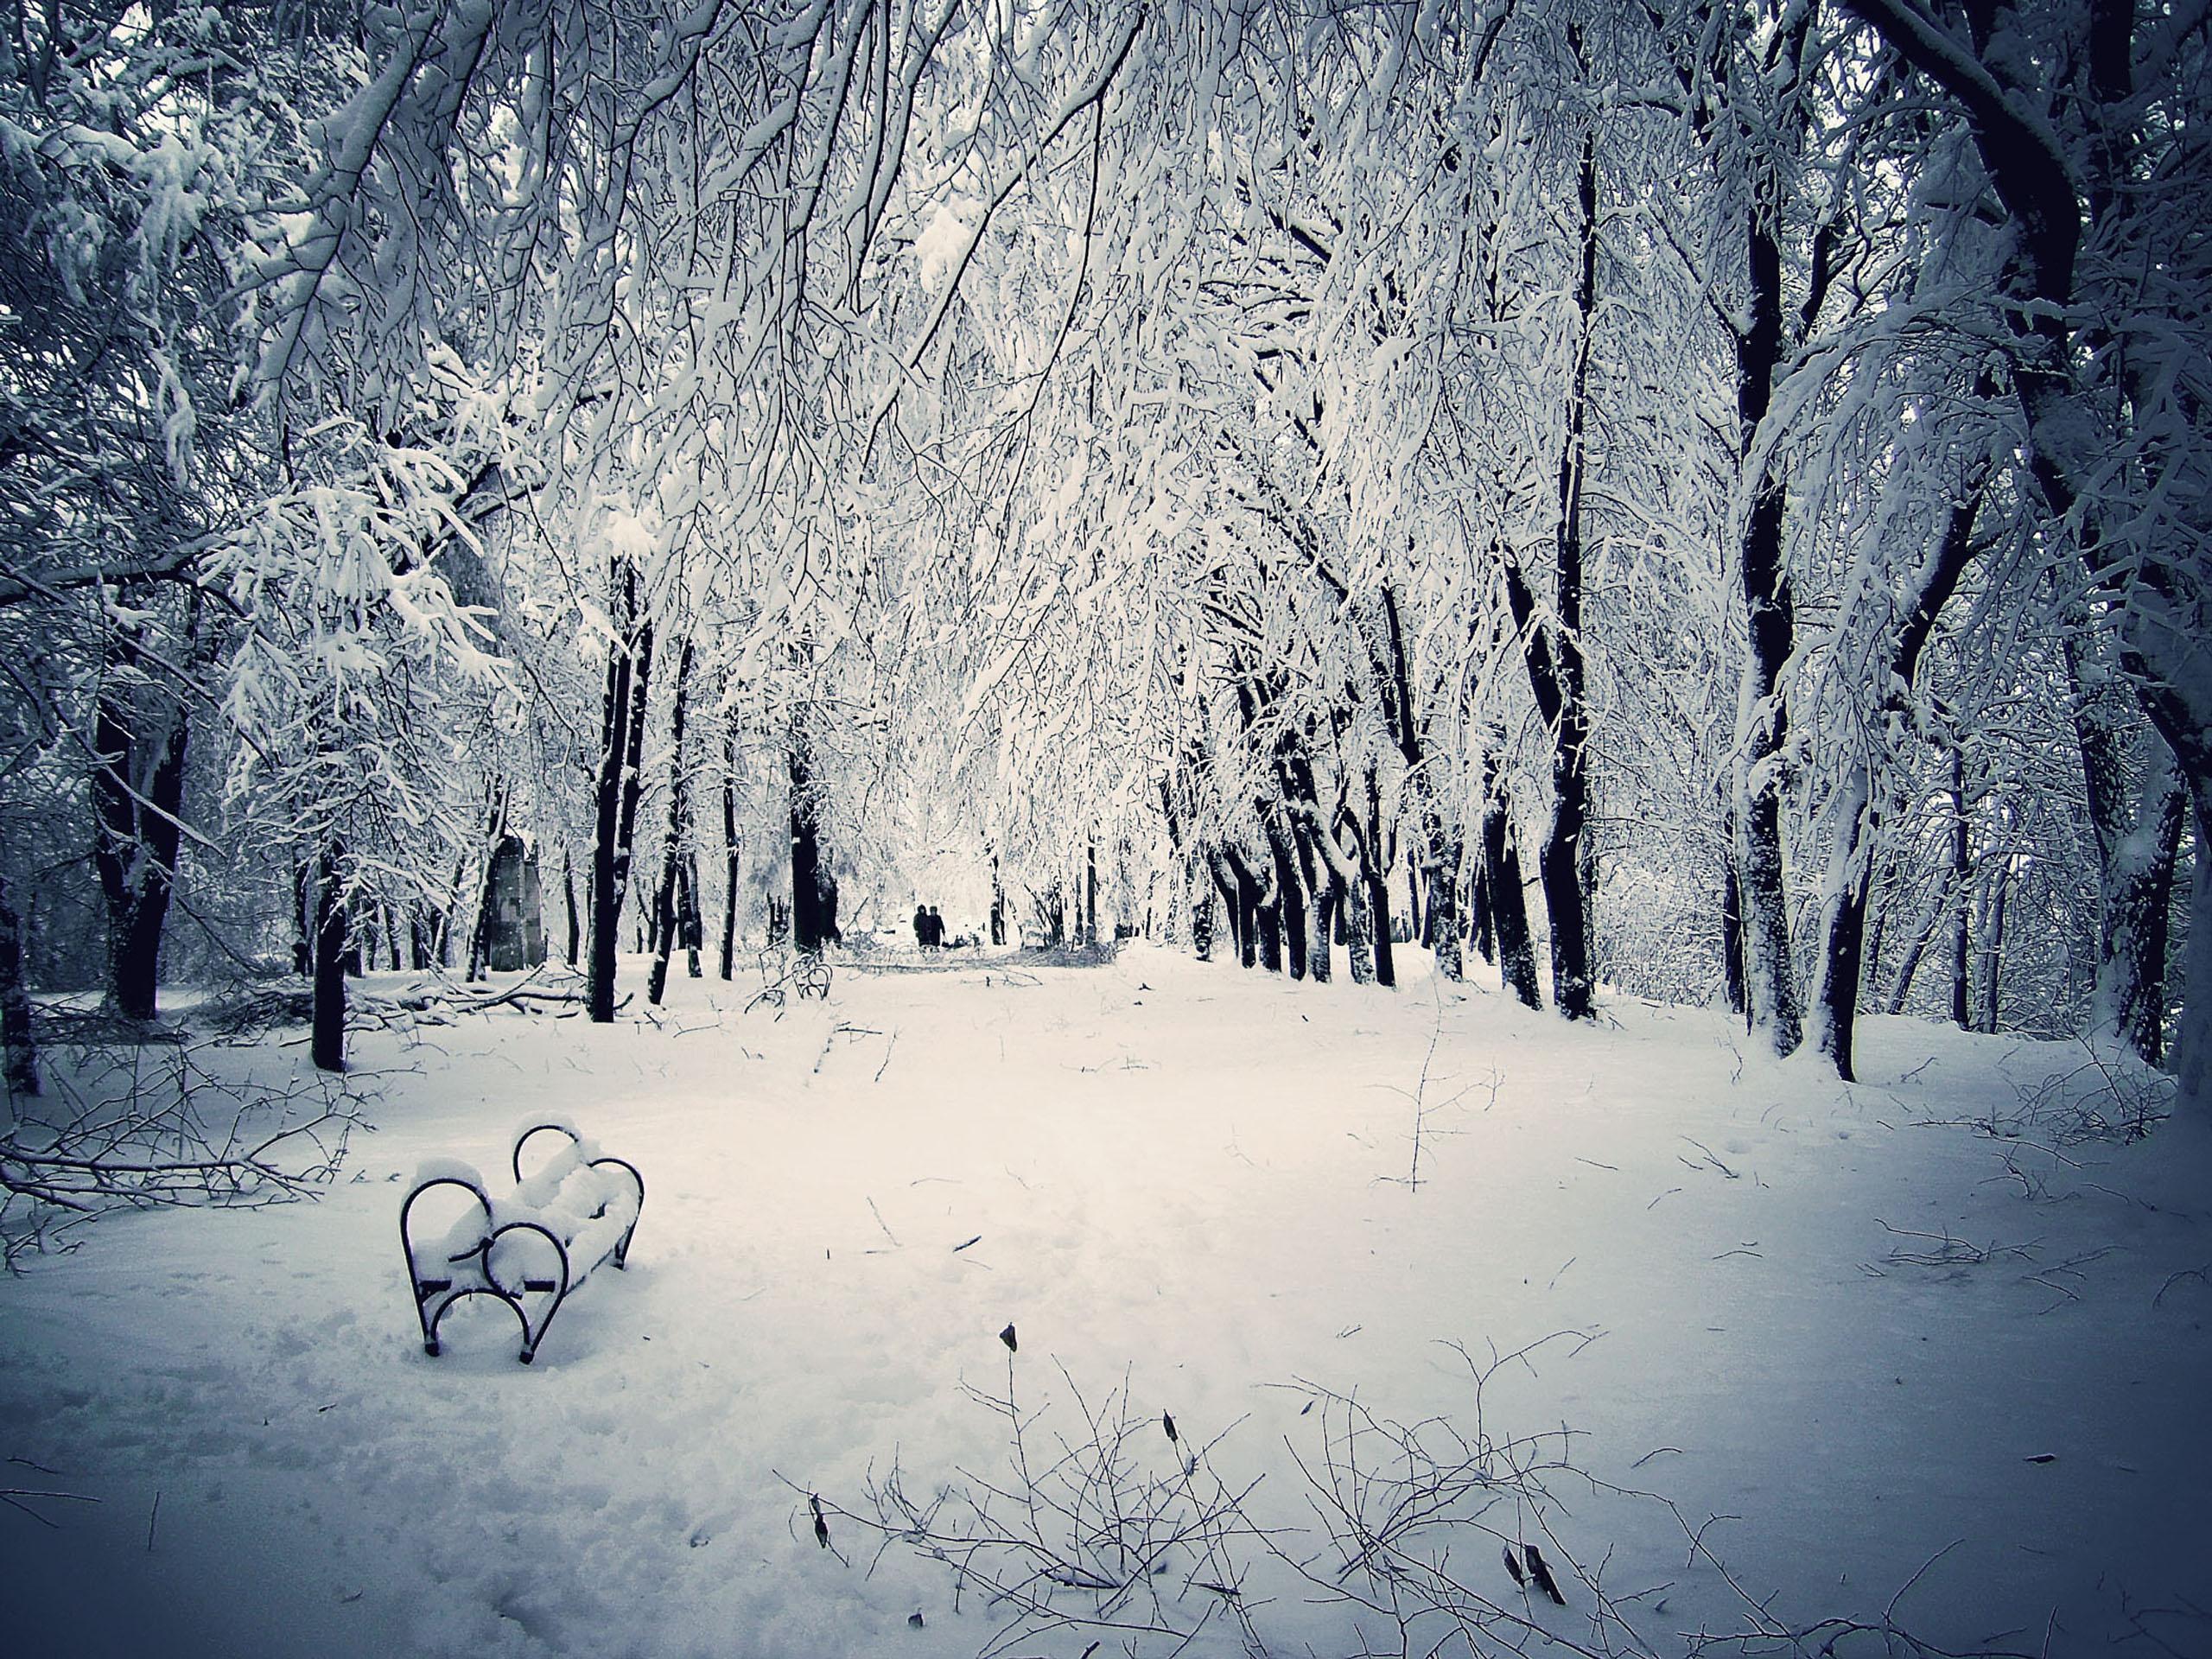 winter snow scenes wallpaper 2015   Grasscloth Wallpaper 2560x1920